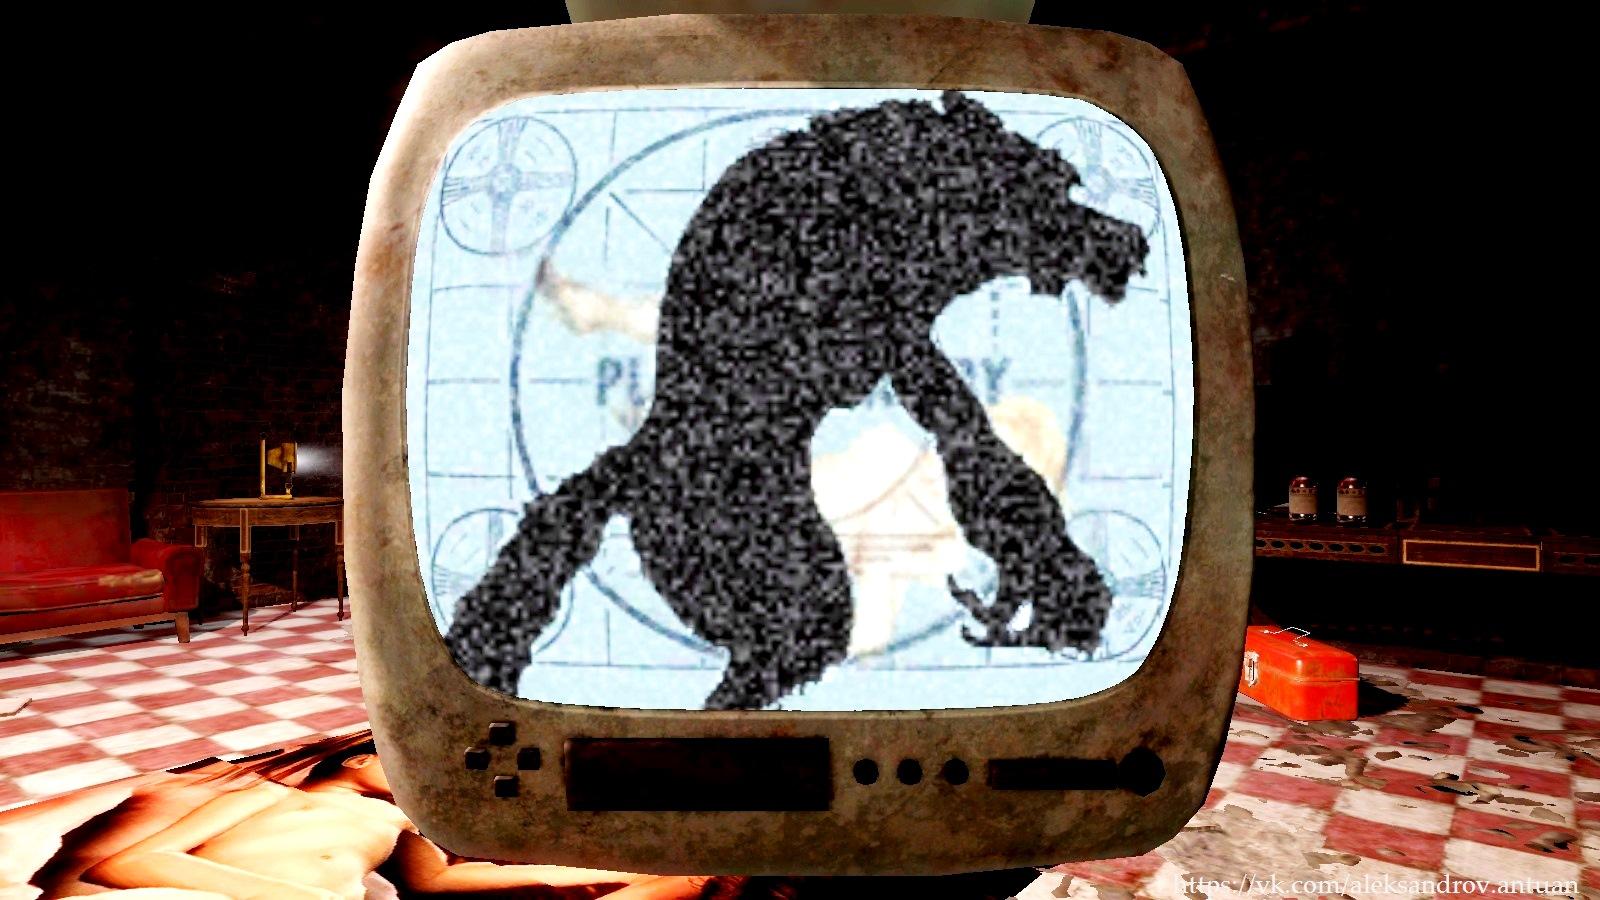 Телевизор. - Fallout 4 Анимированная заставка, Телевизор